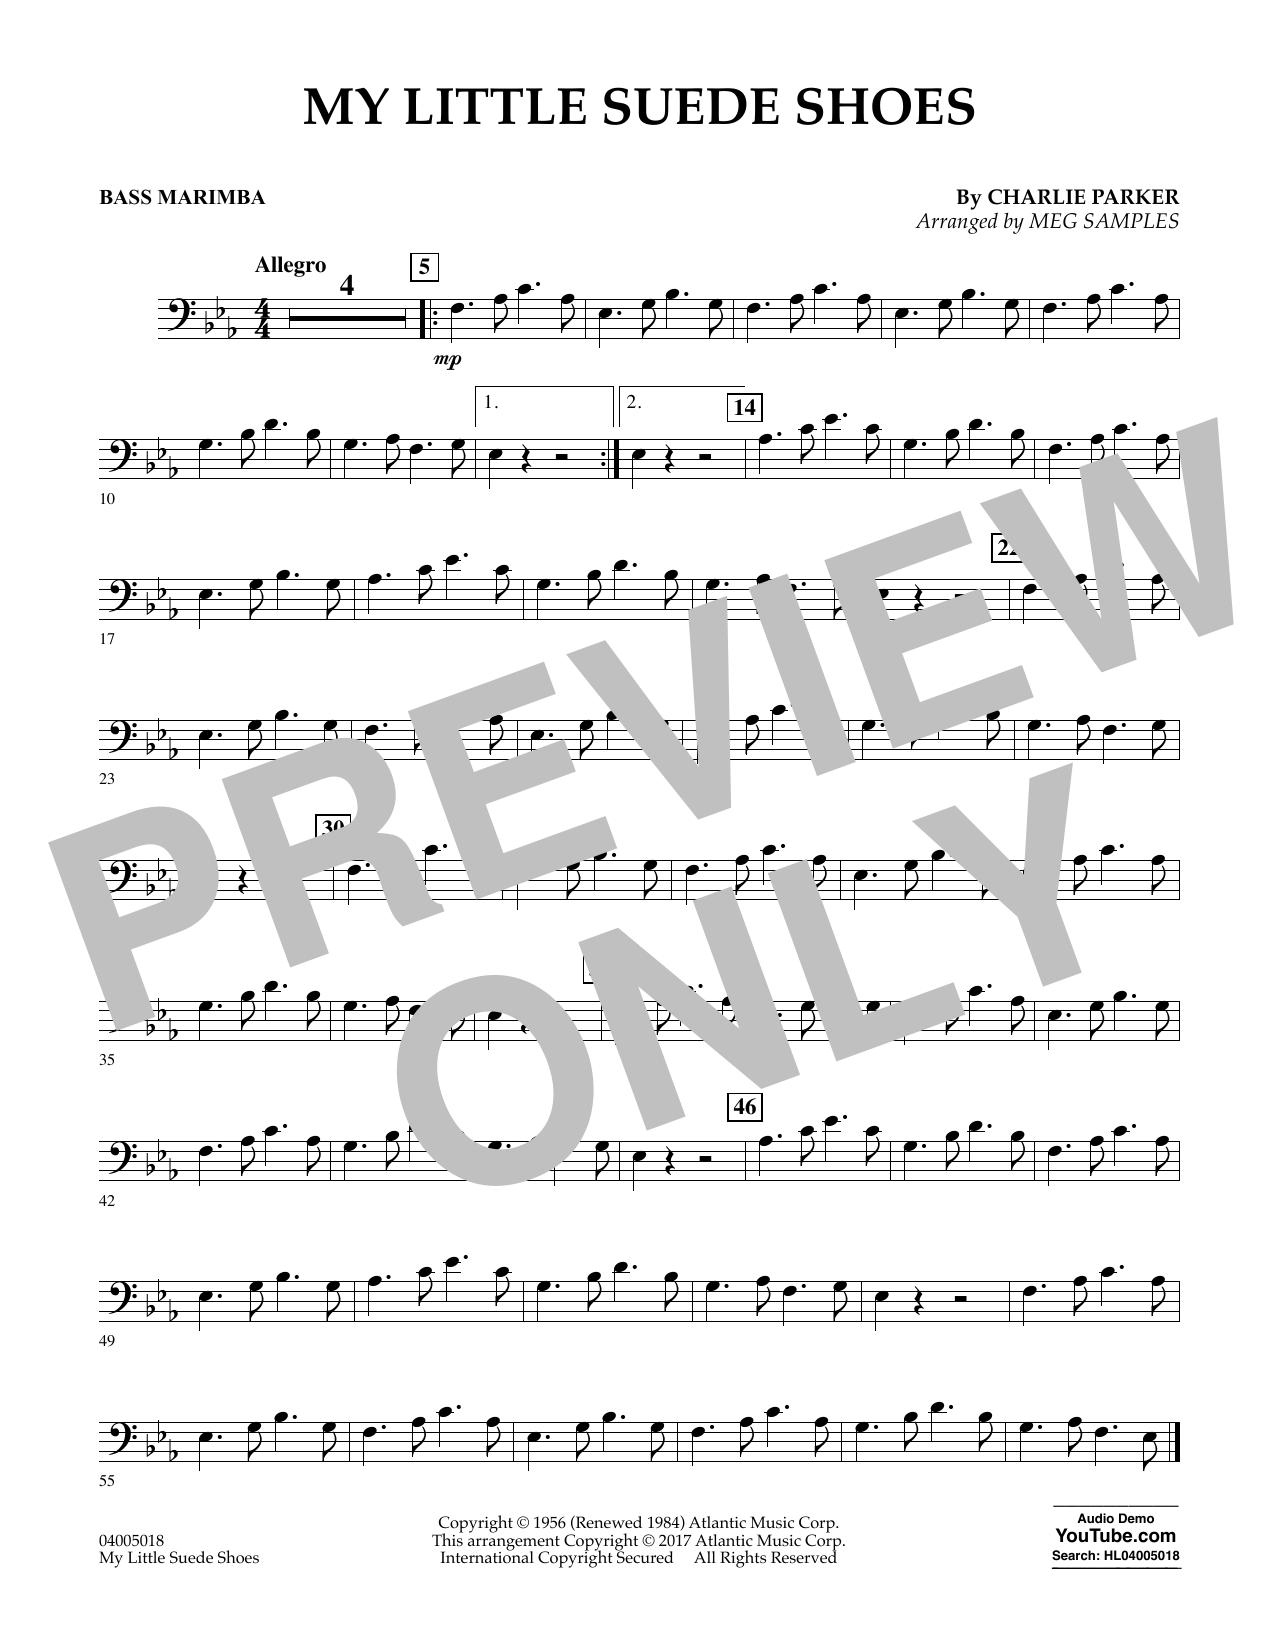 My Little Suede Shoes - Bass Marimba Sheet Music